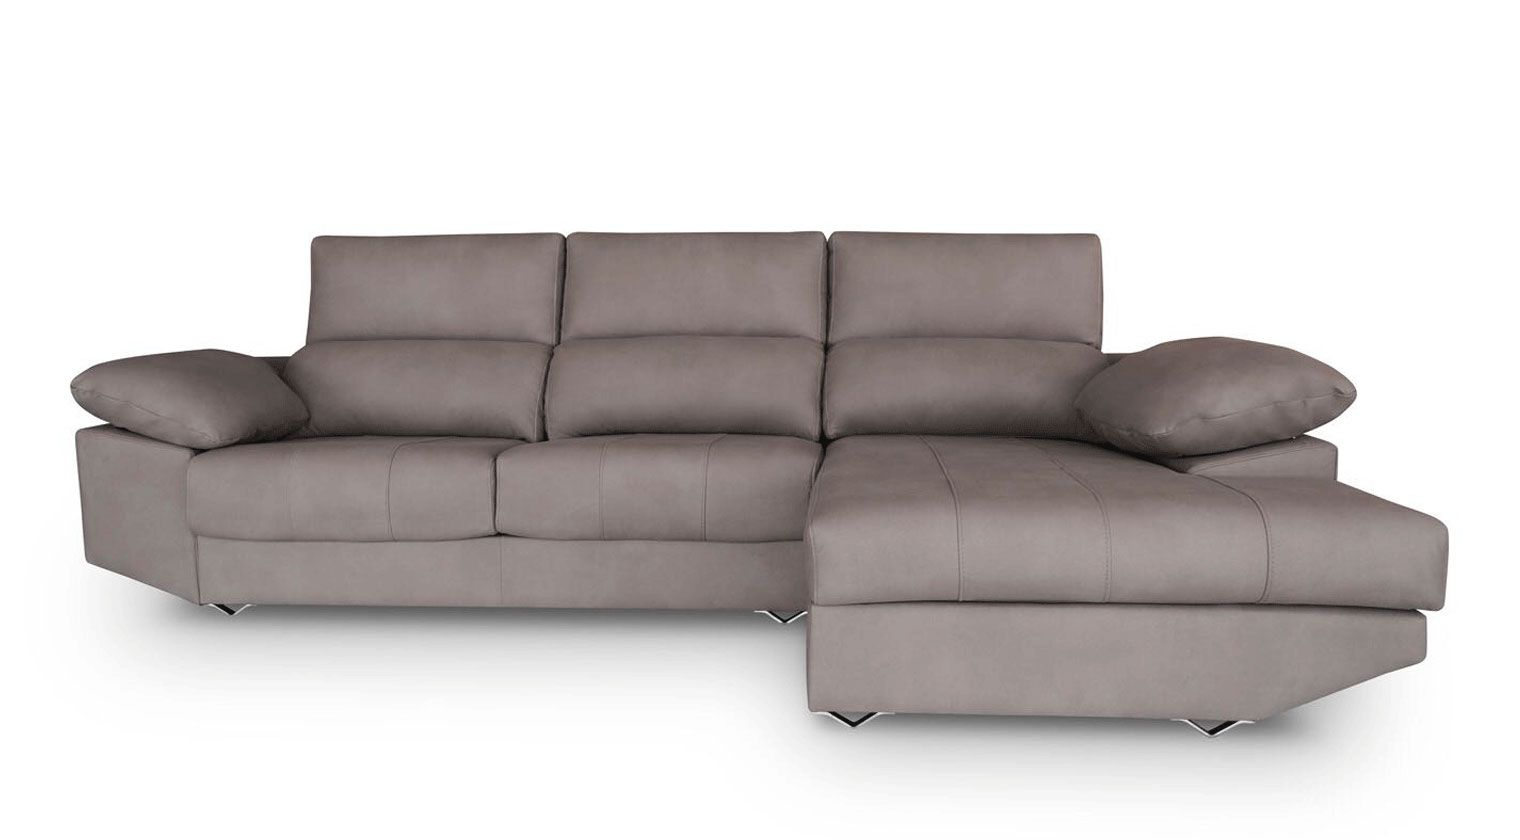 Sof tela invictus chaise longue tela for Sofa gran confort precios